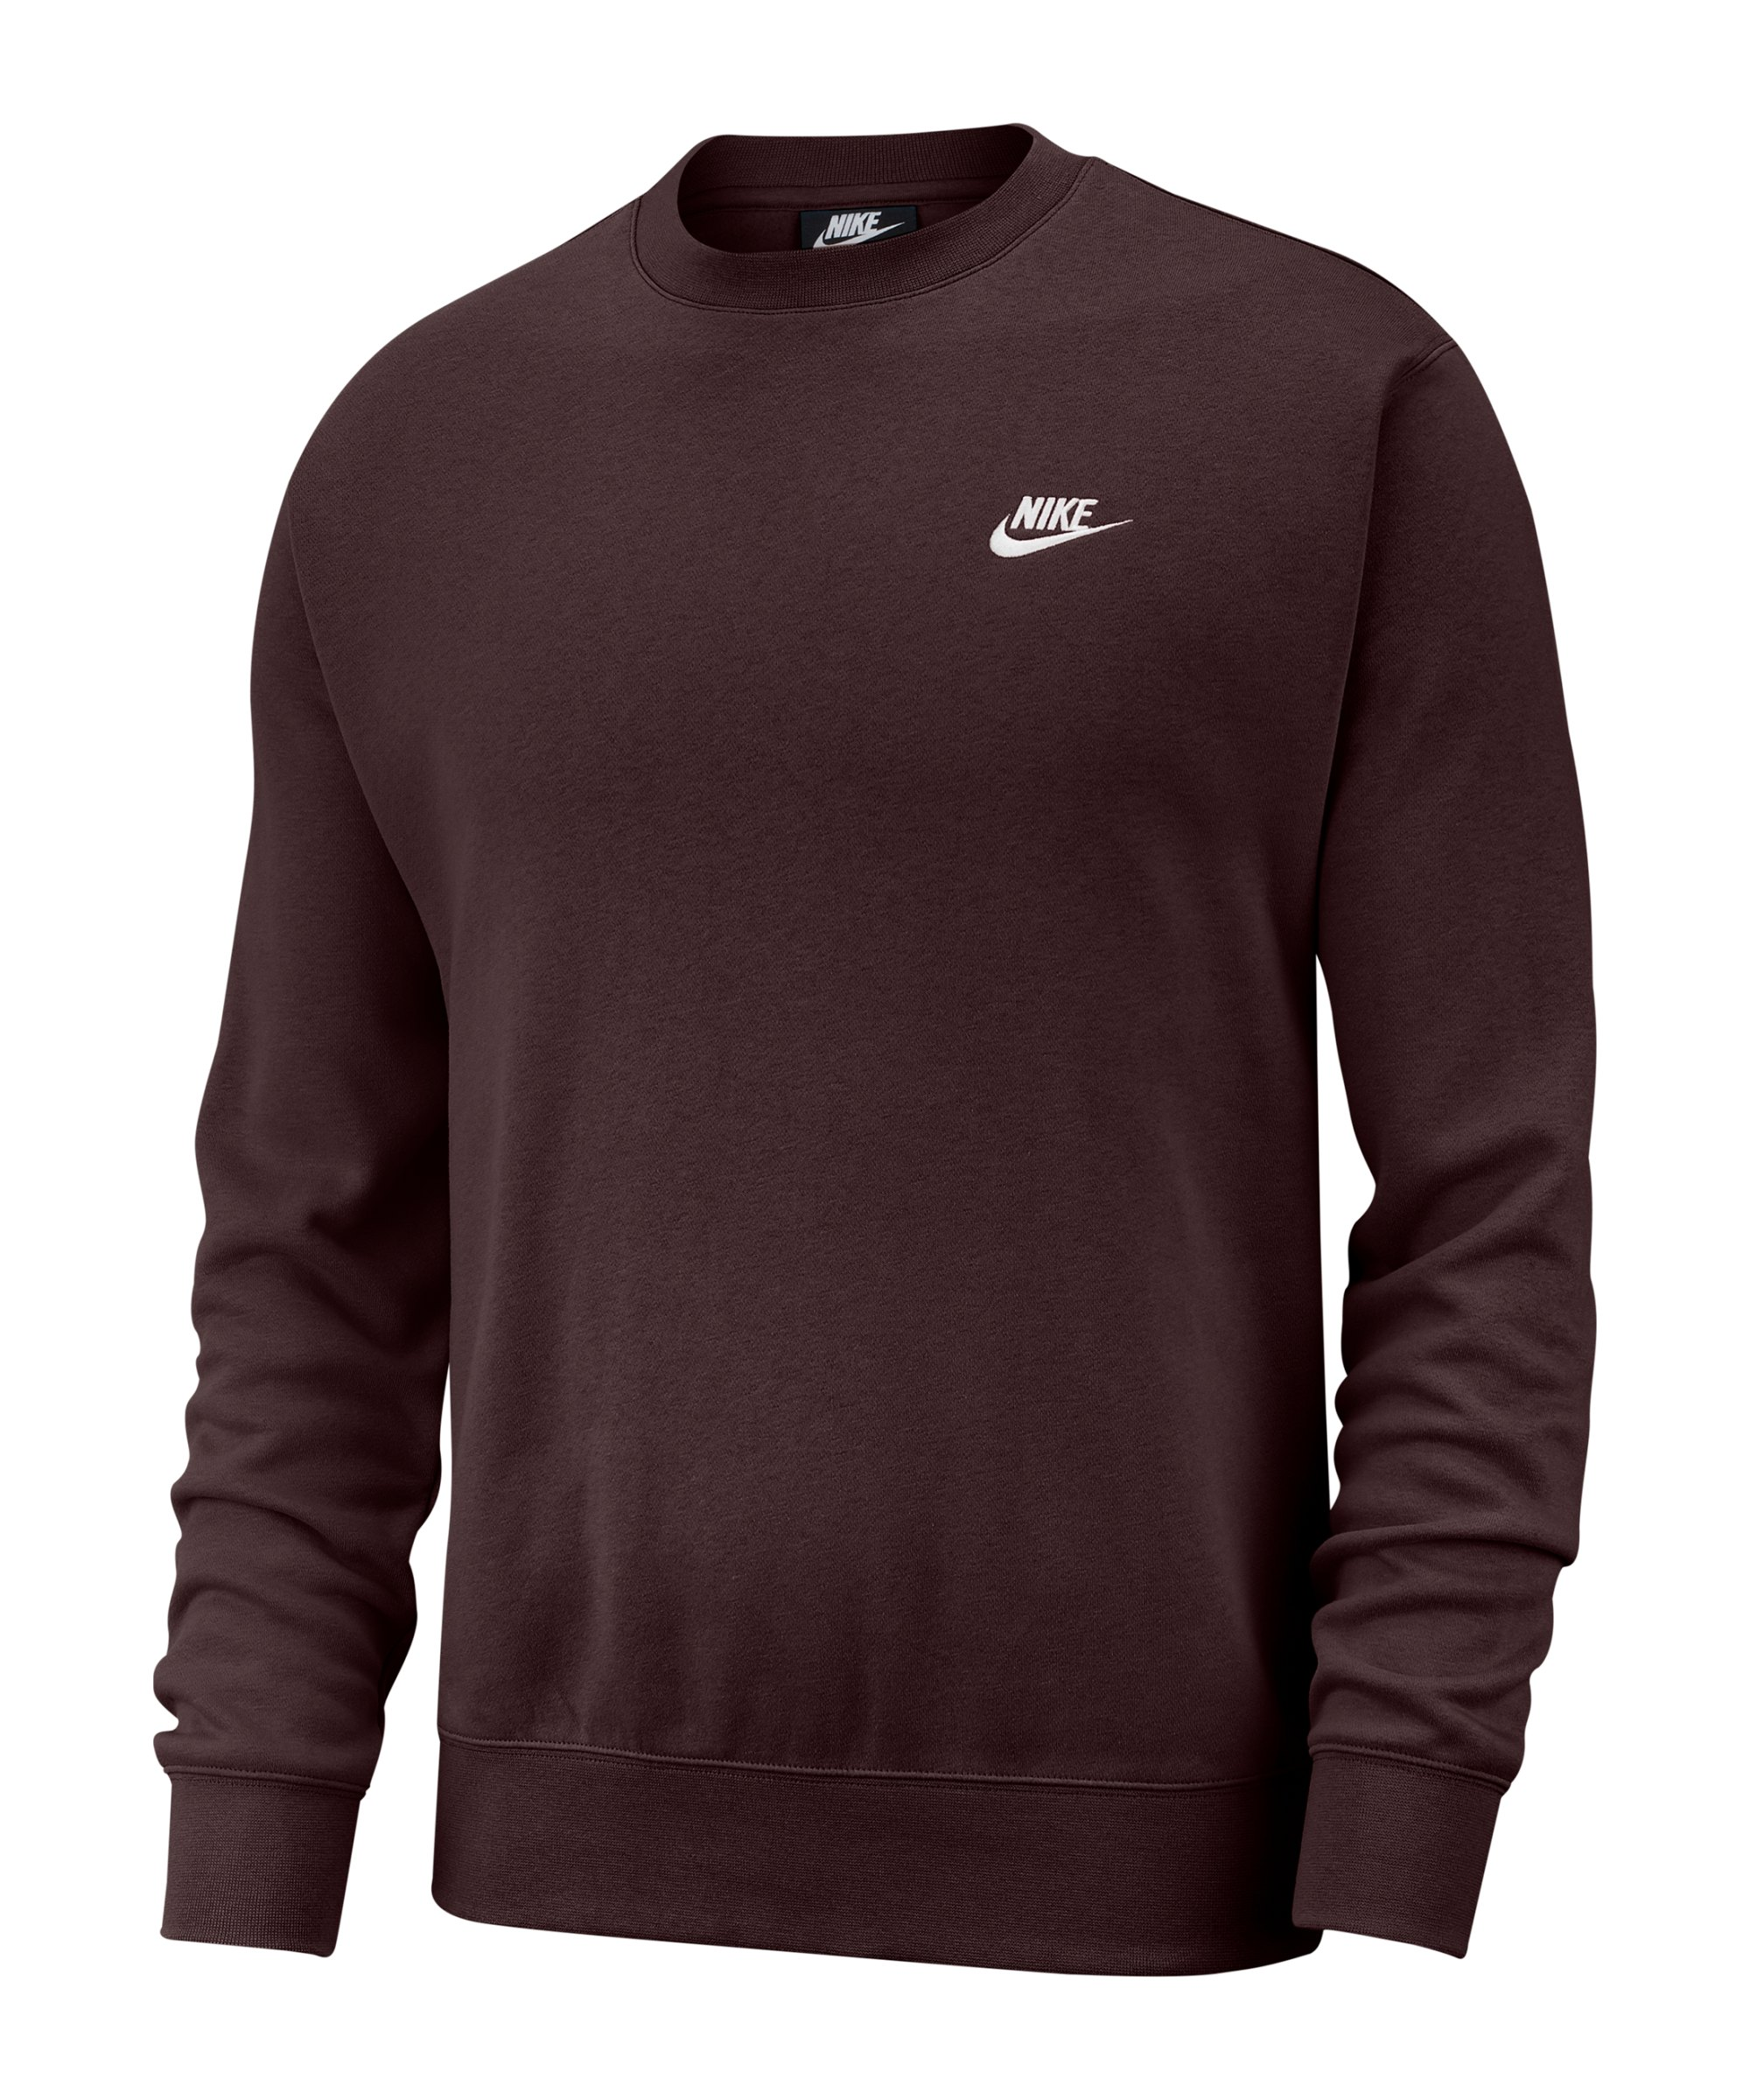 Nike Club Crew Sweatshirt Braun F263 - braun